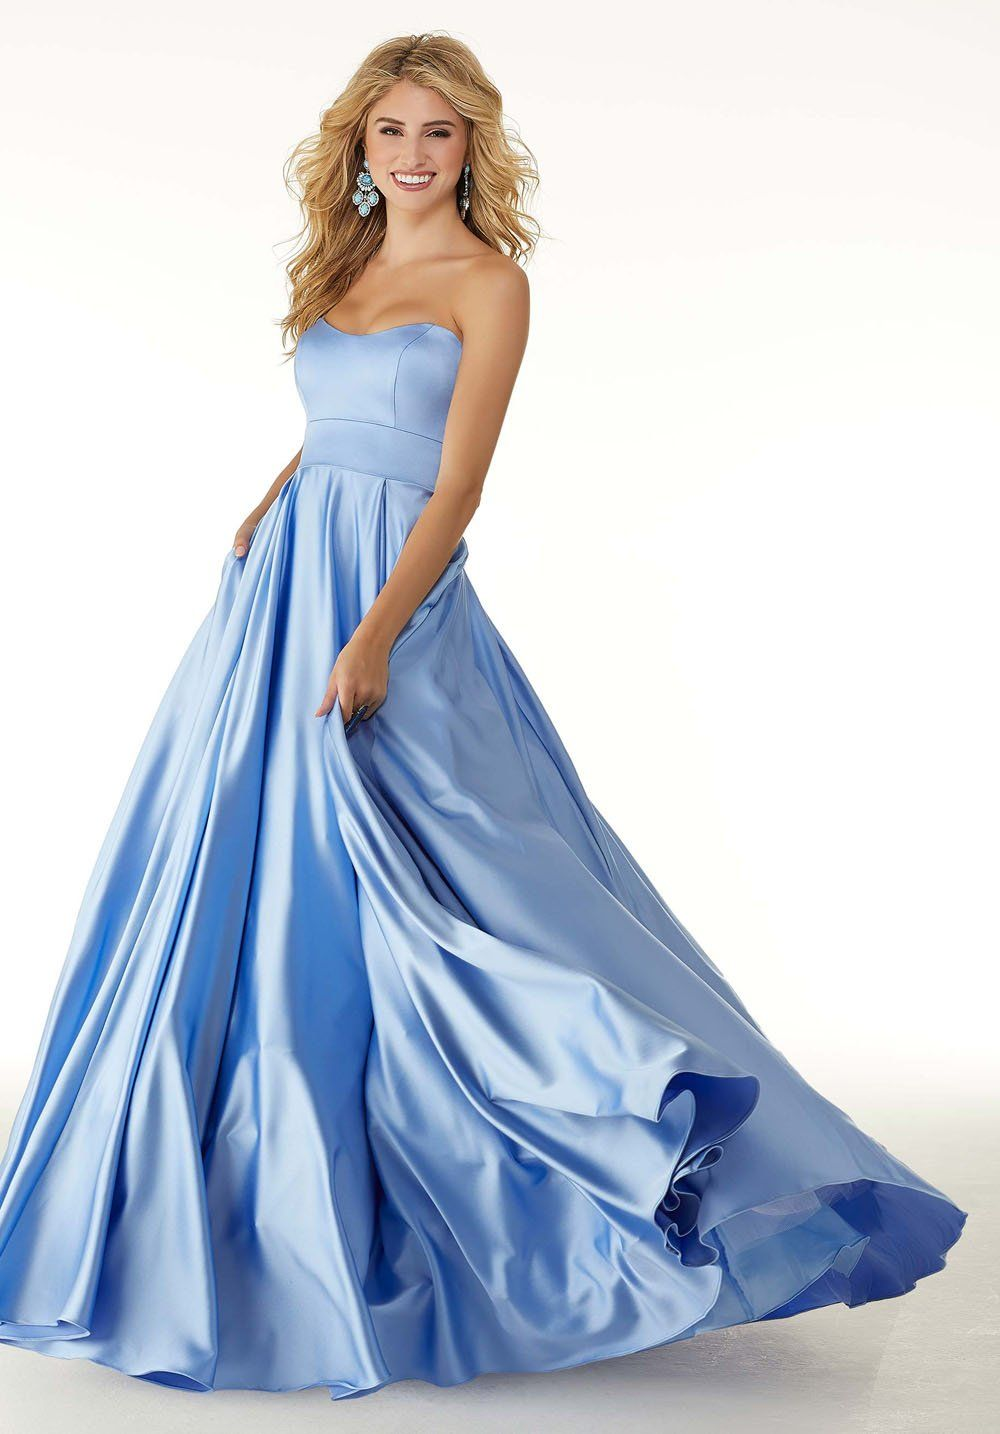 Morilee 45090 Dress Satin Dress Long Prom Dresses Ball Gown Prom Dresses [ 1434 x 1000 Pixel ]